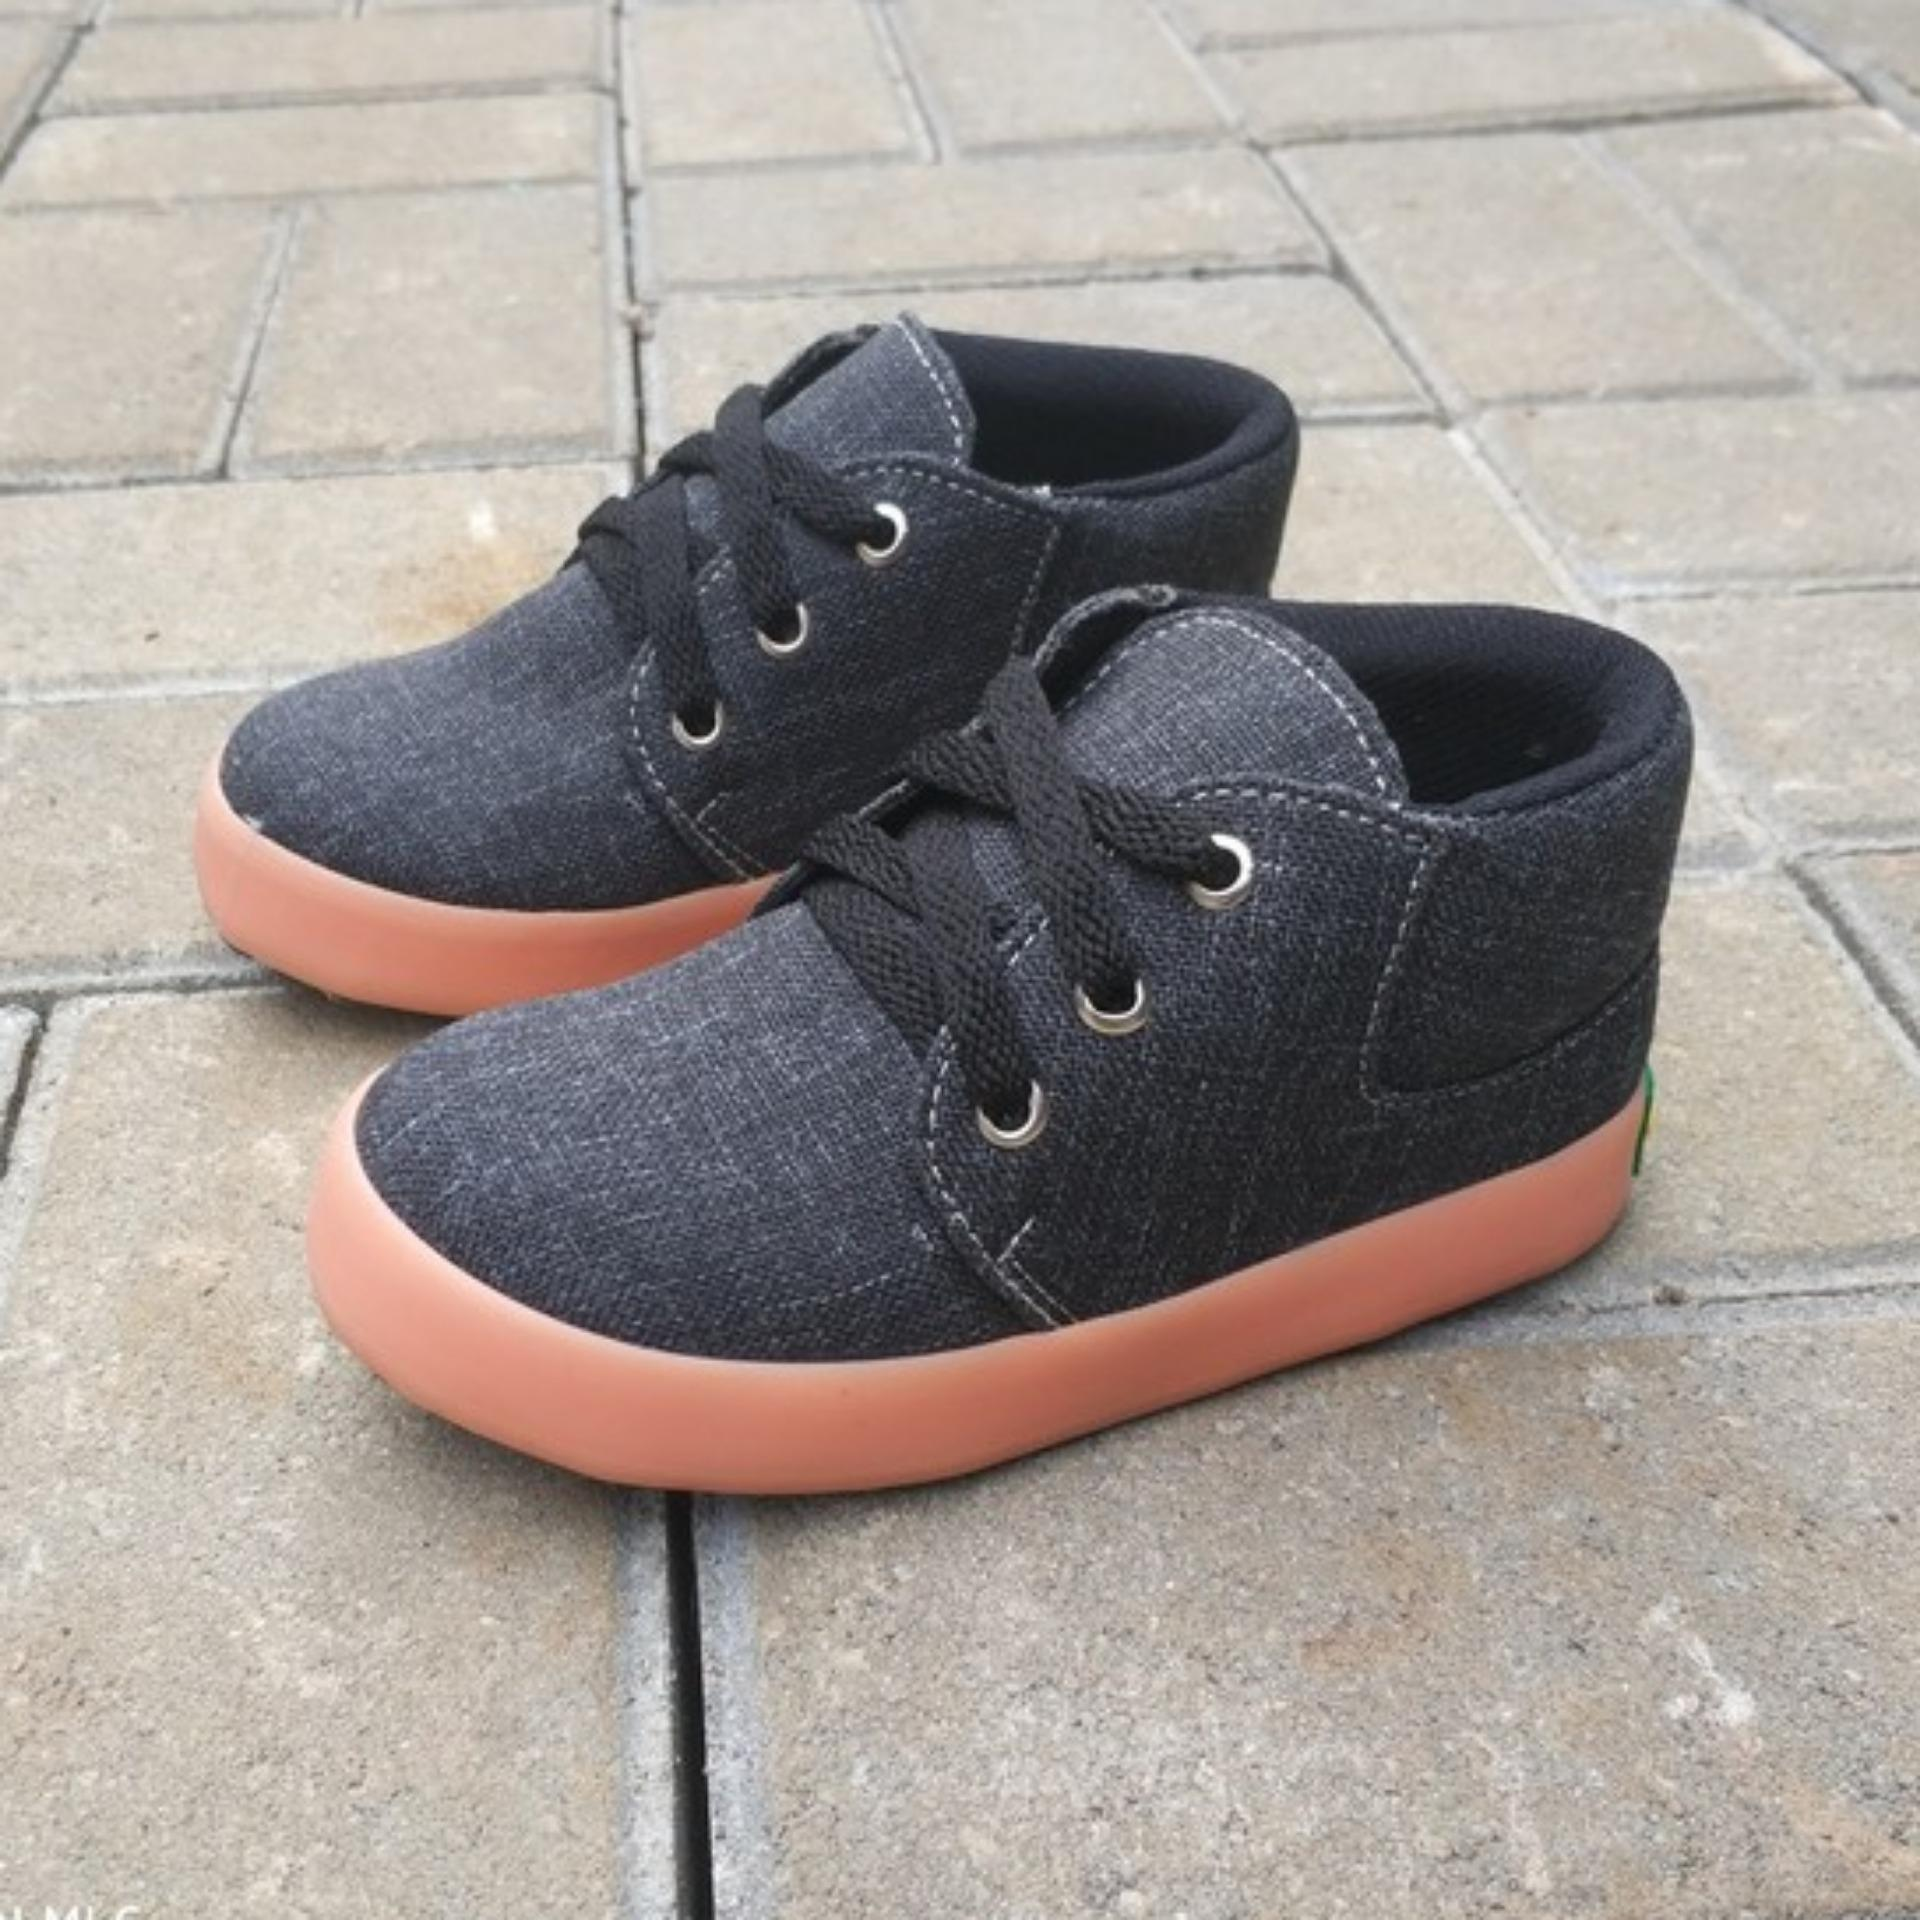 Beli Shuku Sepatu Sneaker Anak Laki Cowok Semi Boot Keren Casual Trendy Kekinian Seken